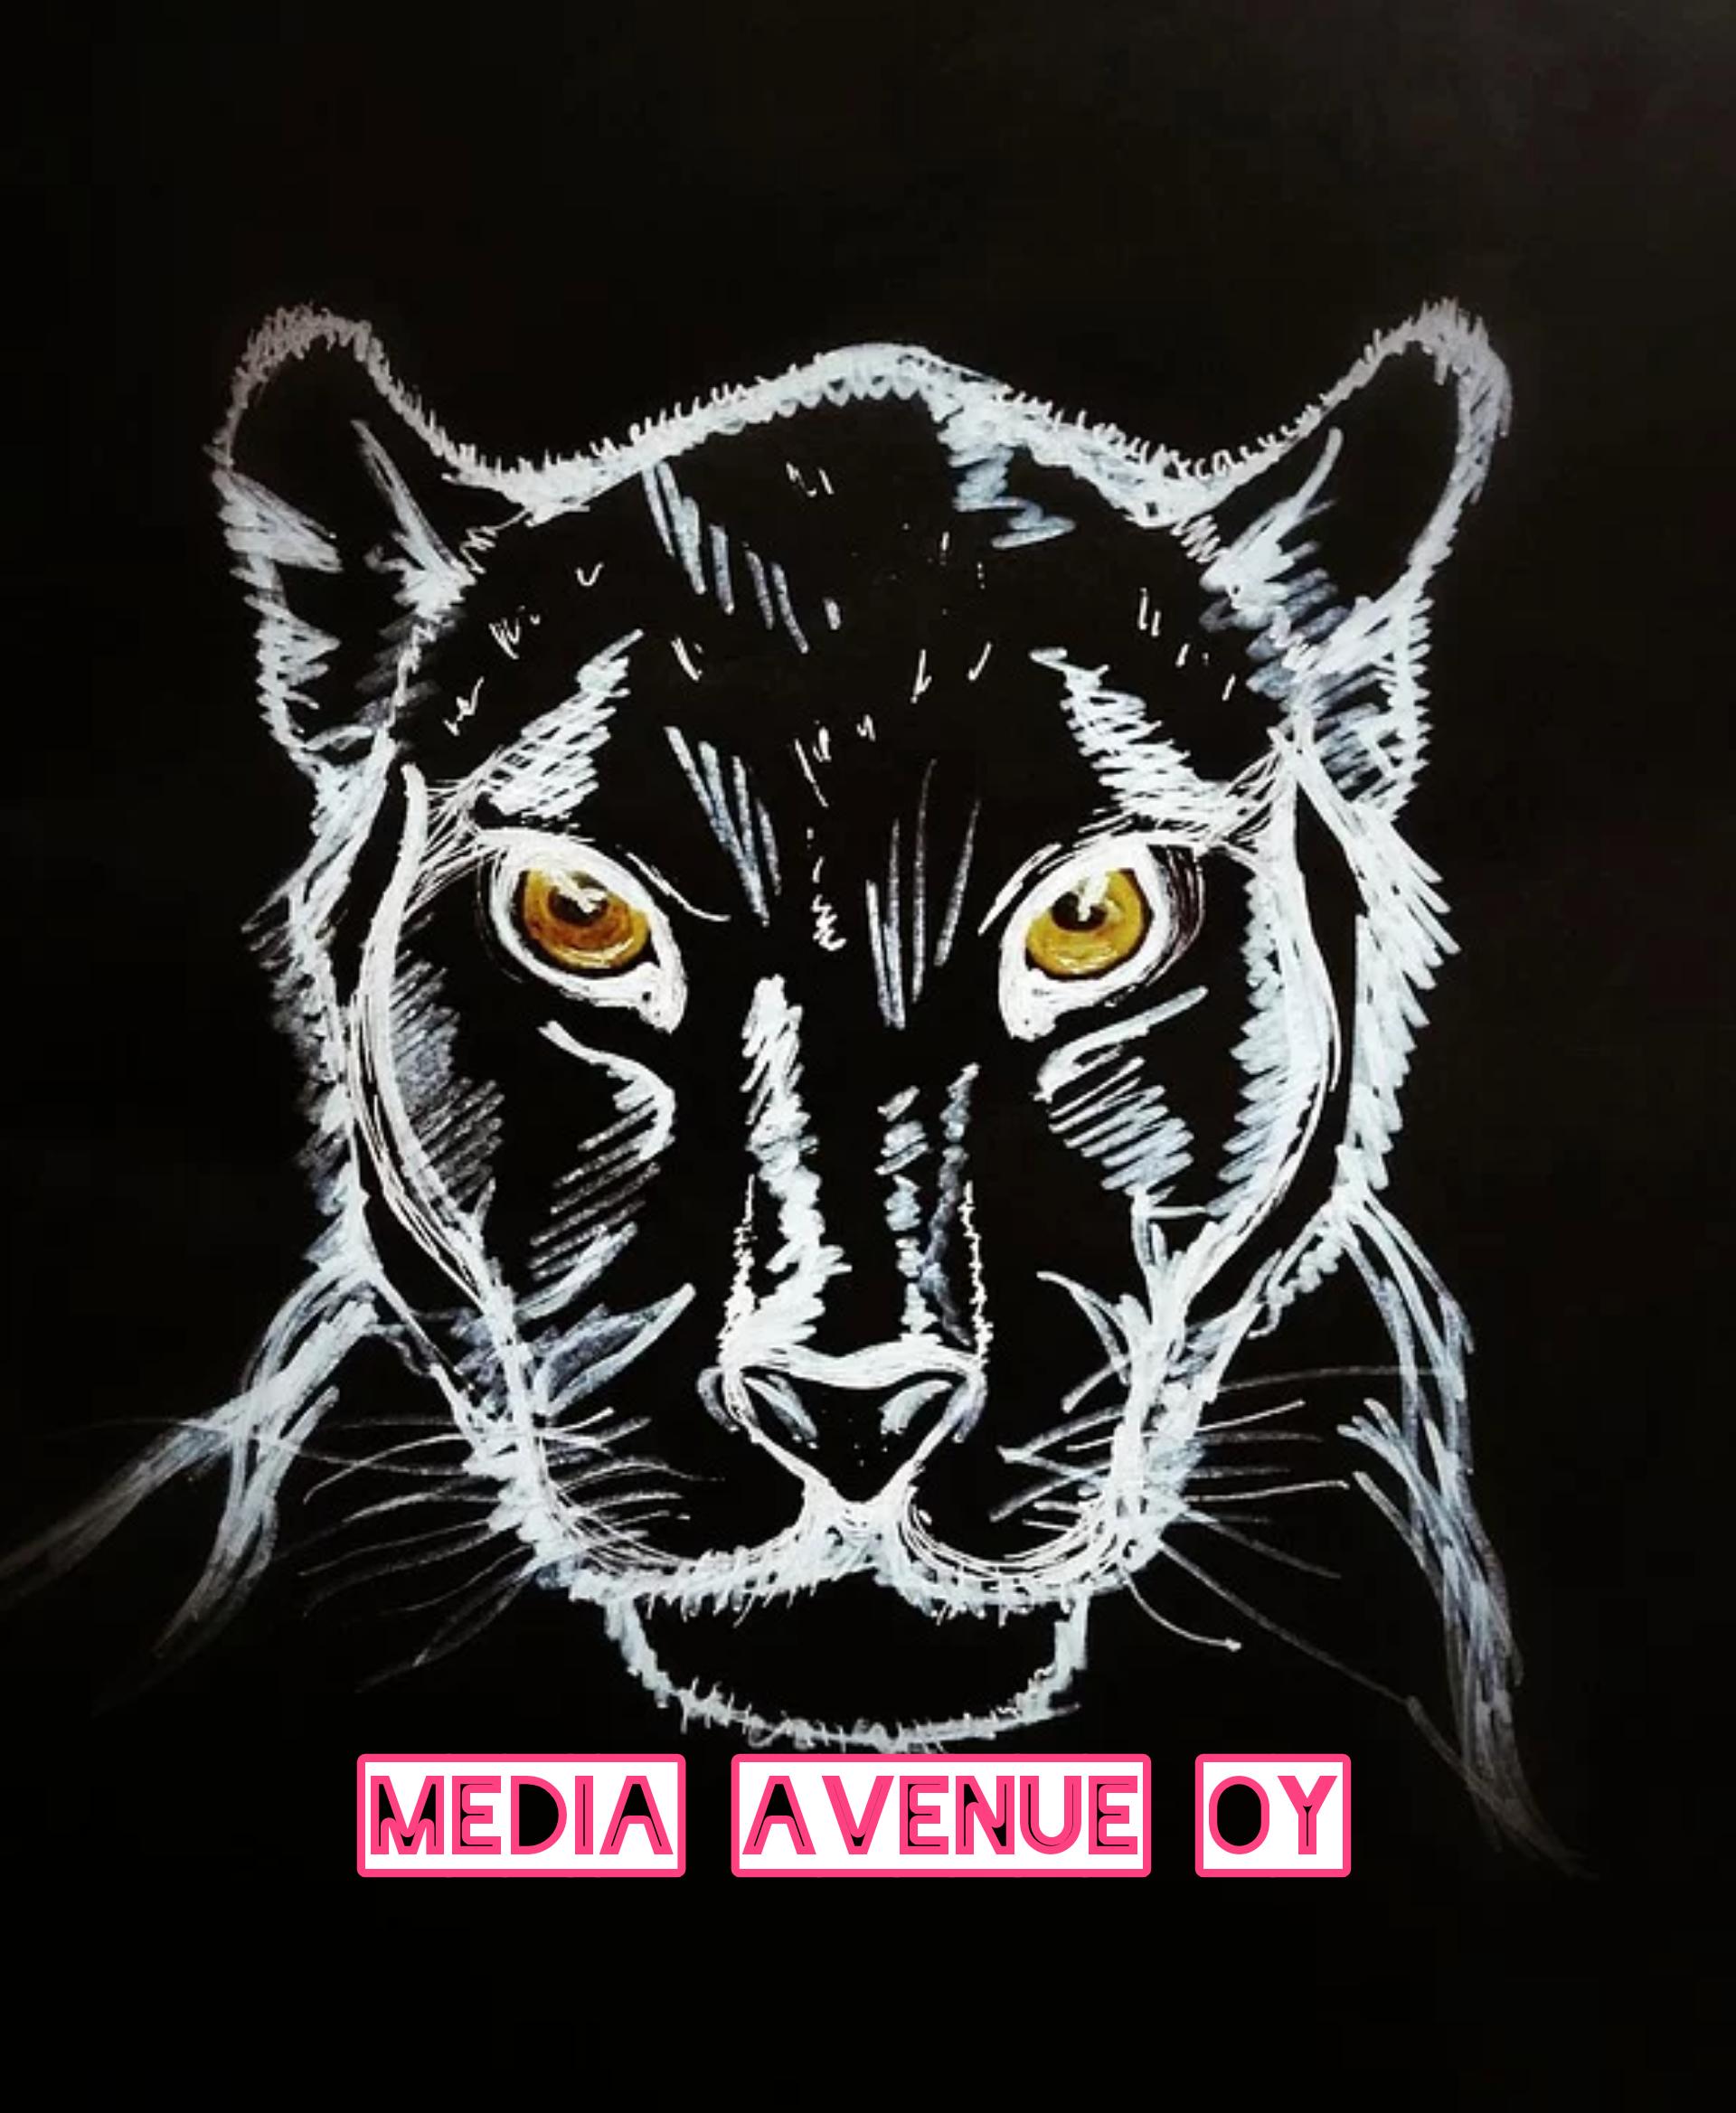 Media Avenue Oy logo